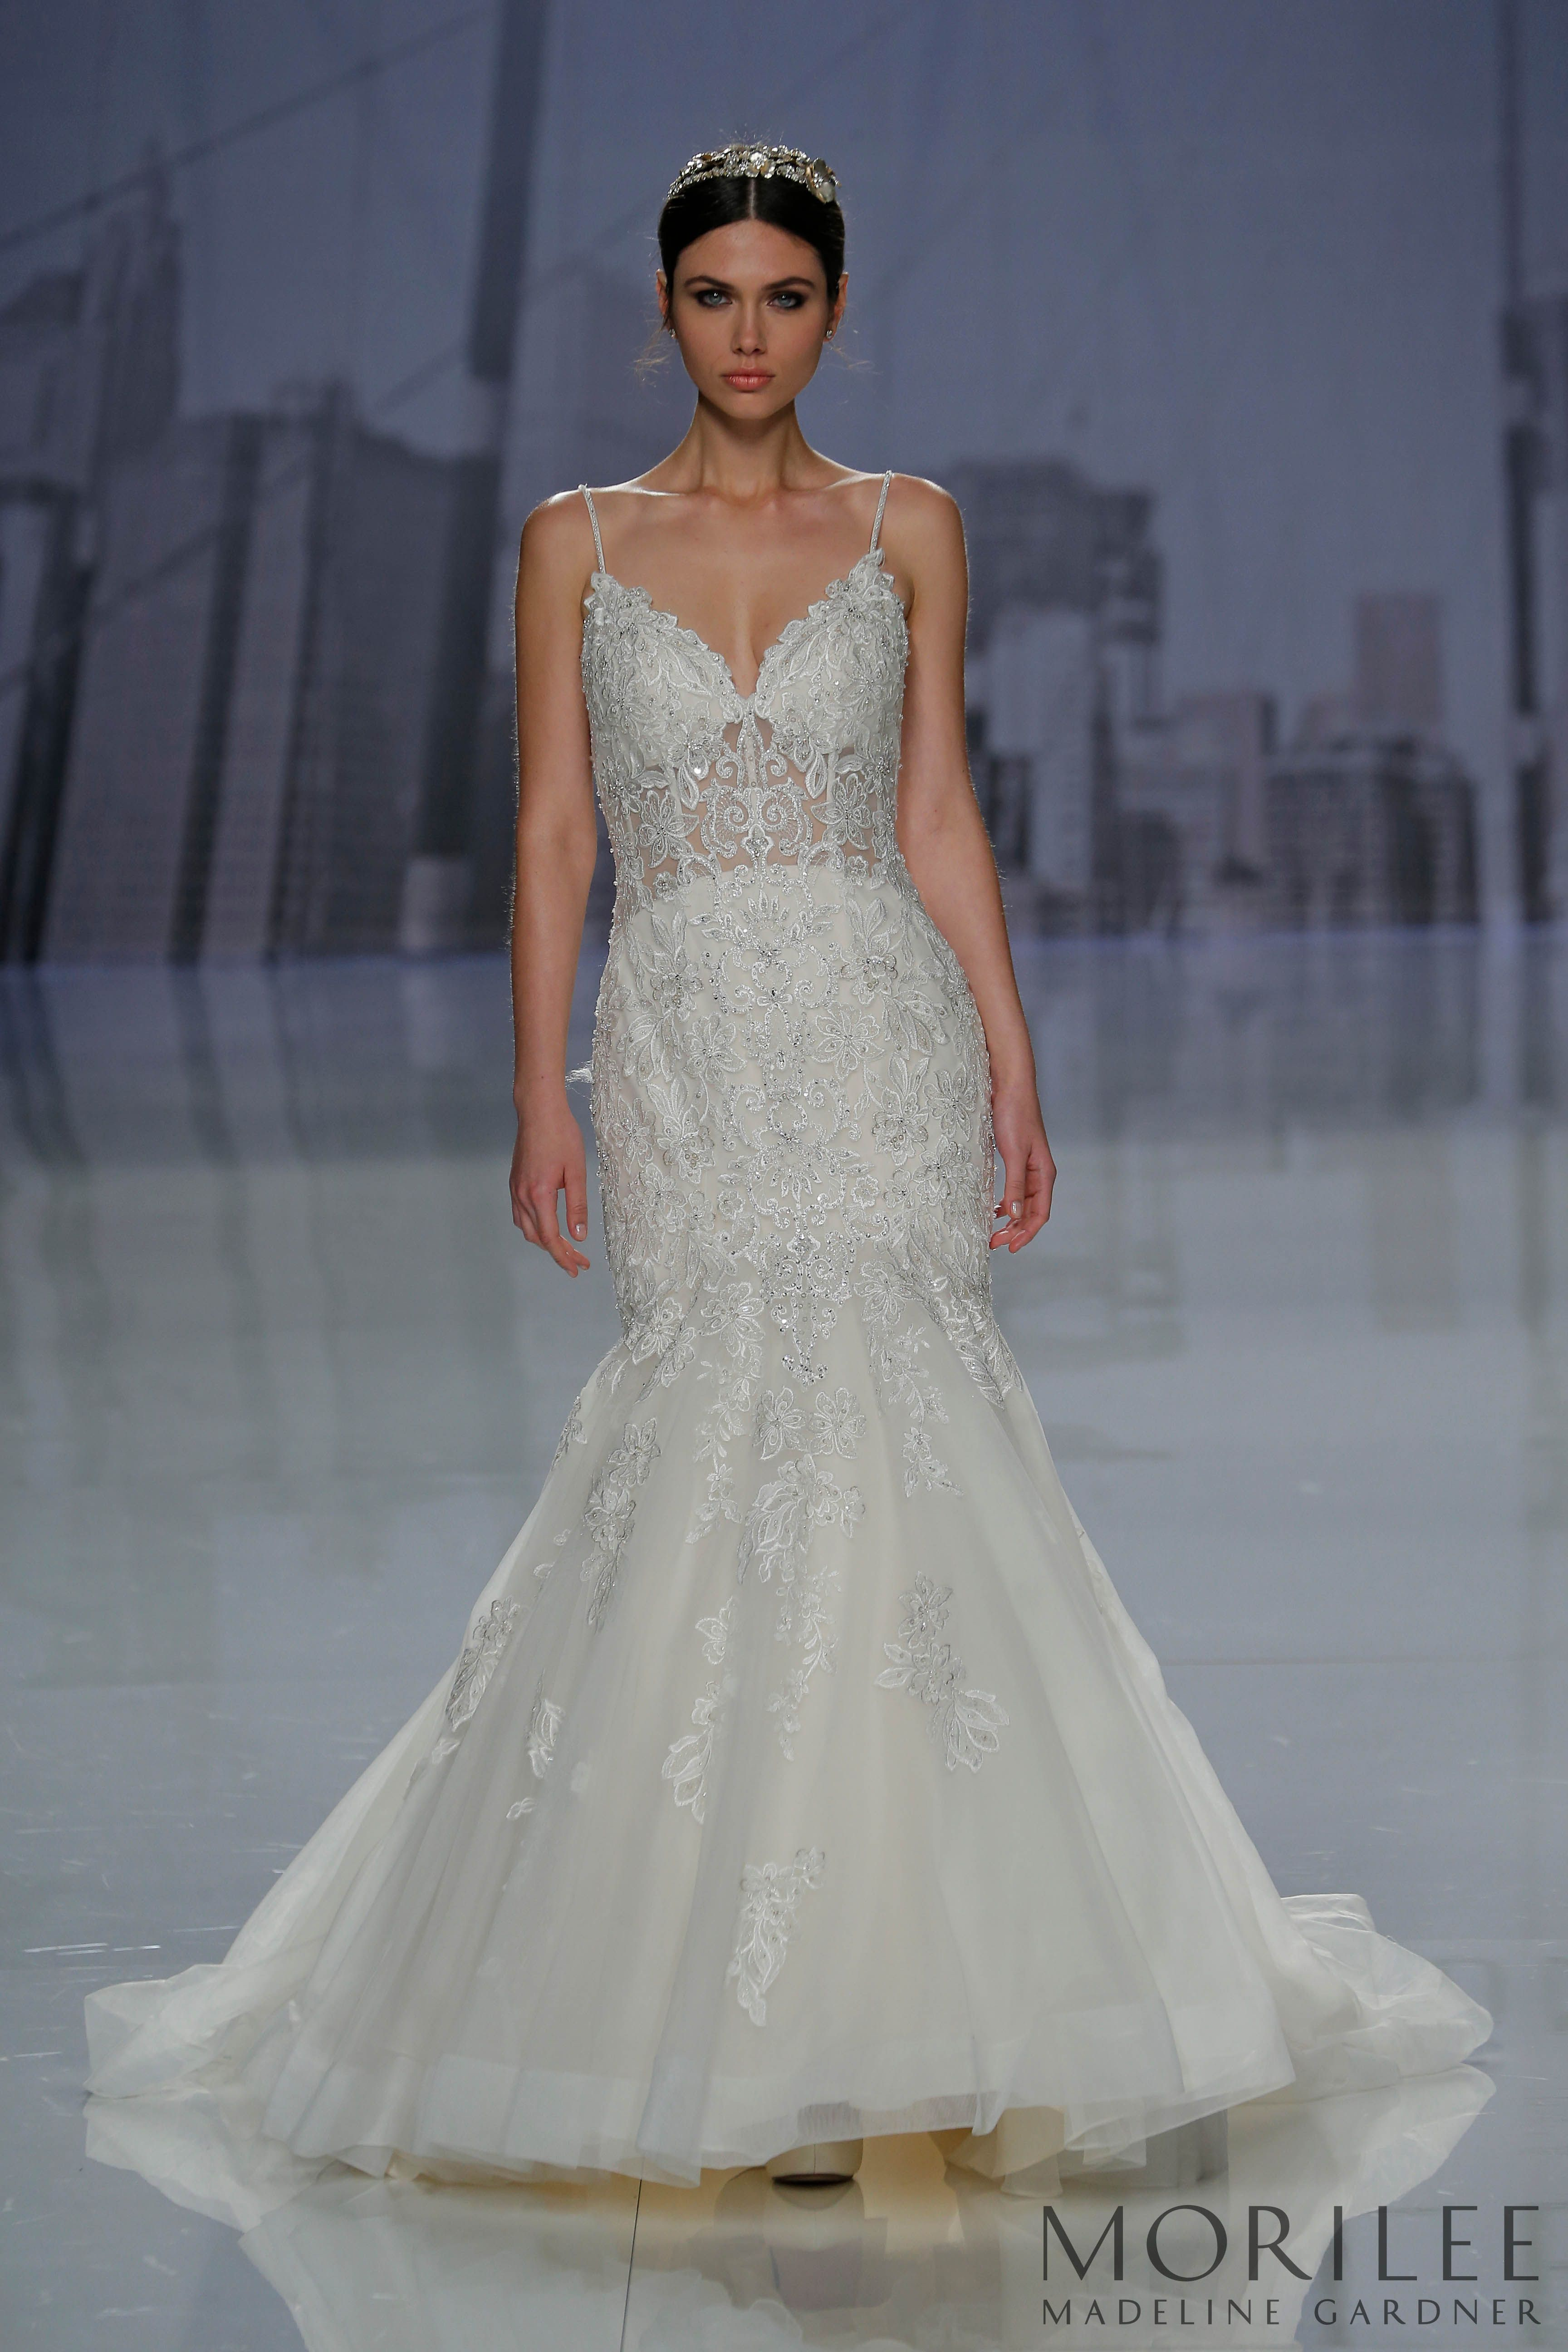 Morilee Madeline Gardner, Mihaiia Wedding Dress. Crystal